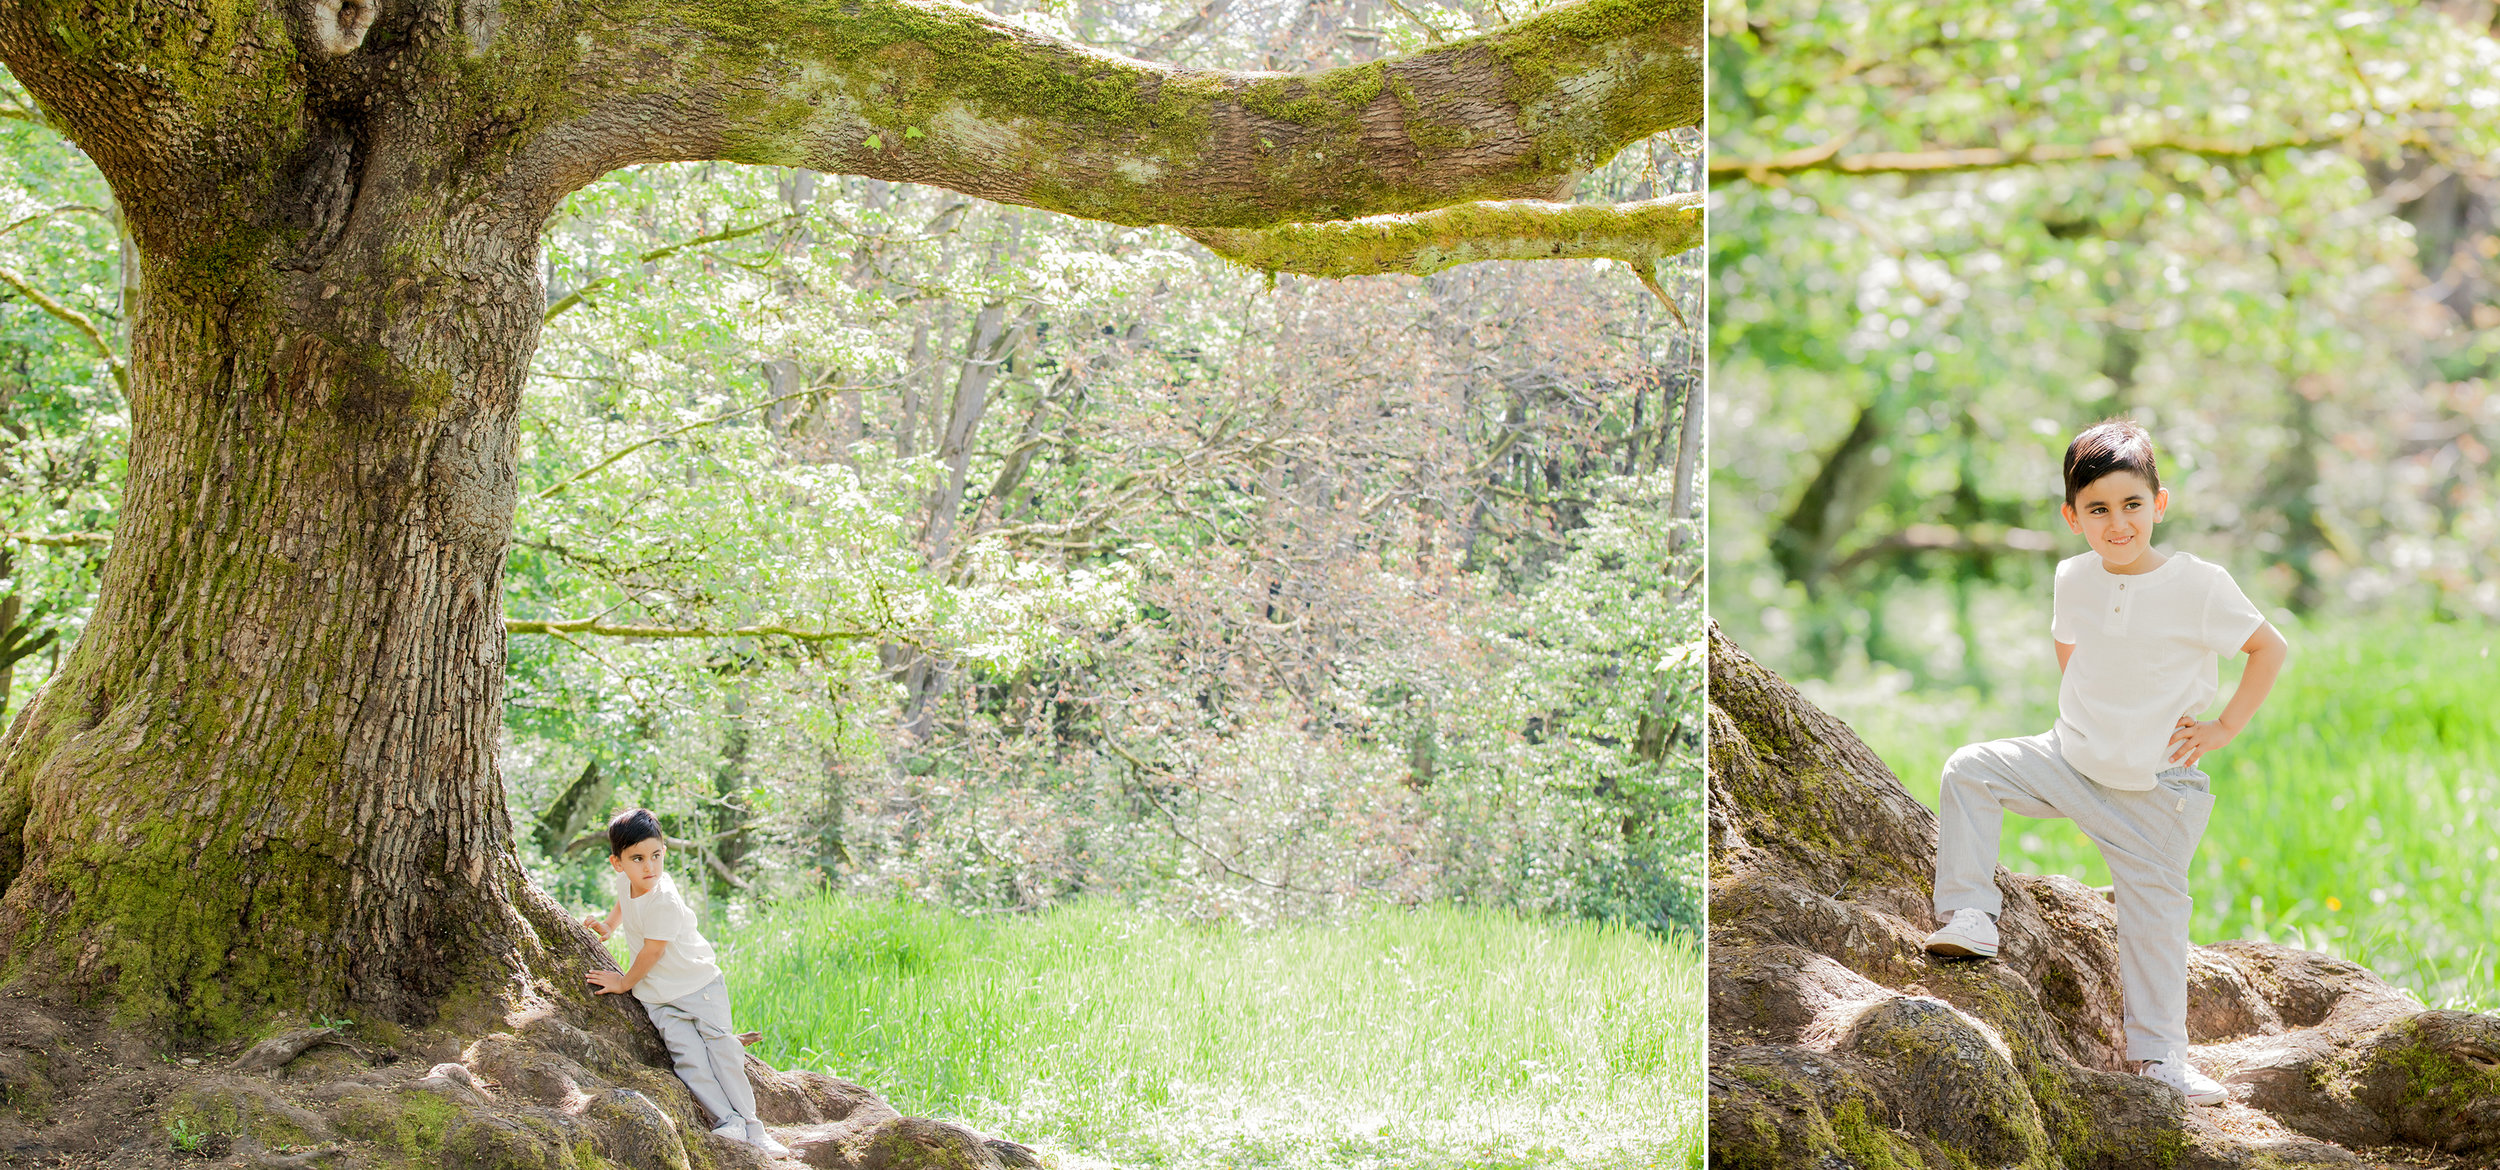 Redwood Park - May 2018 - WT (41 of 175).jpg